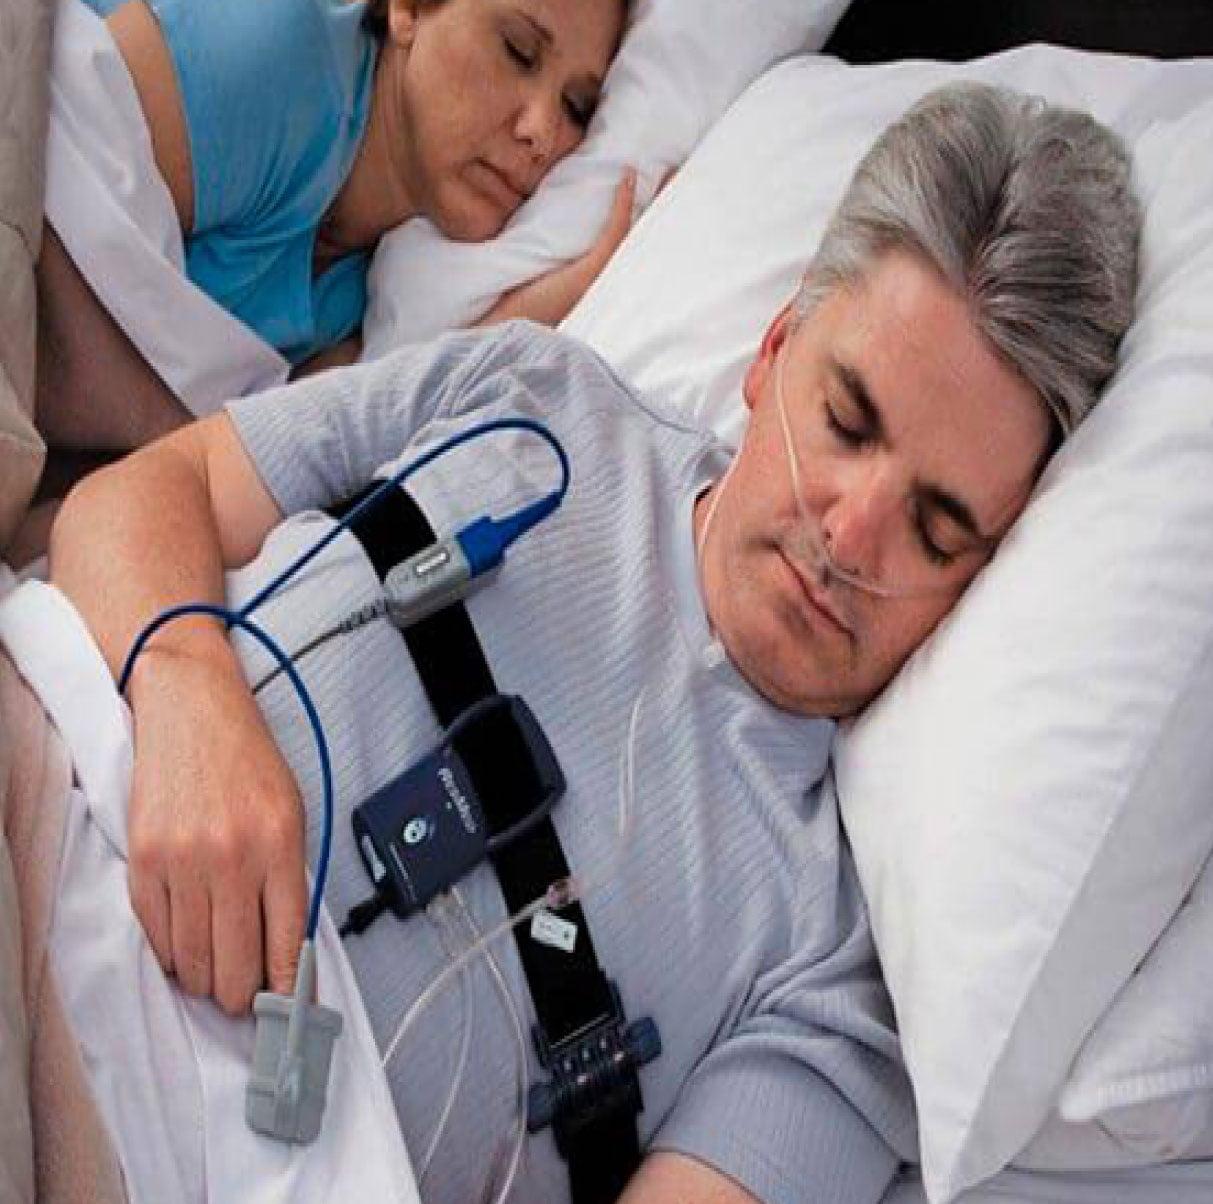 SLEEP APNEA MONITORING USING NODE MCU WITH THINGS PEAK